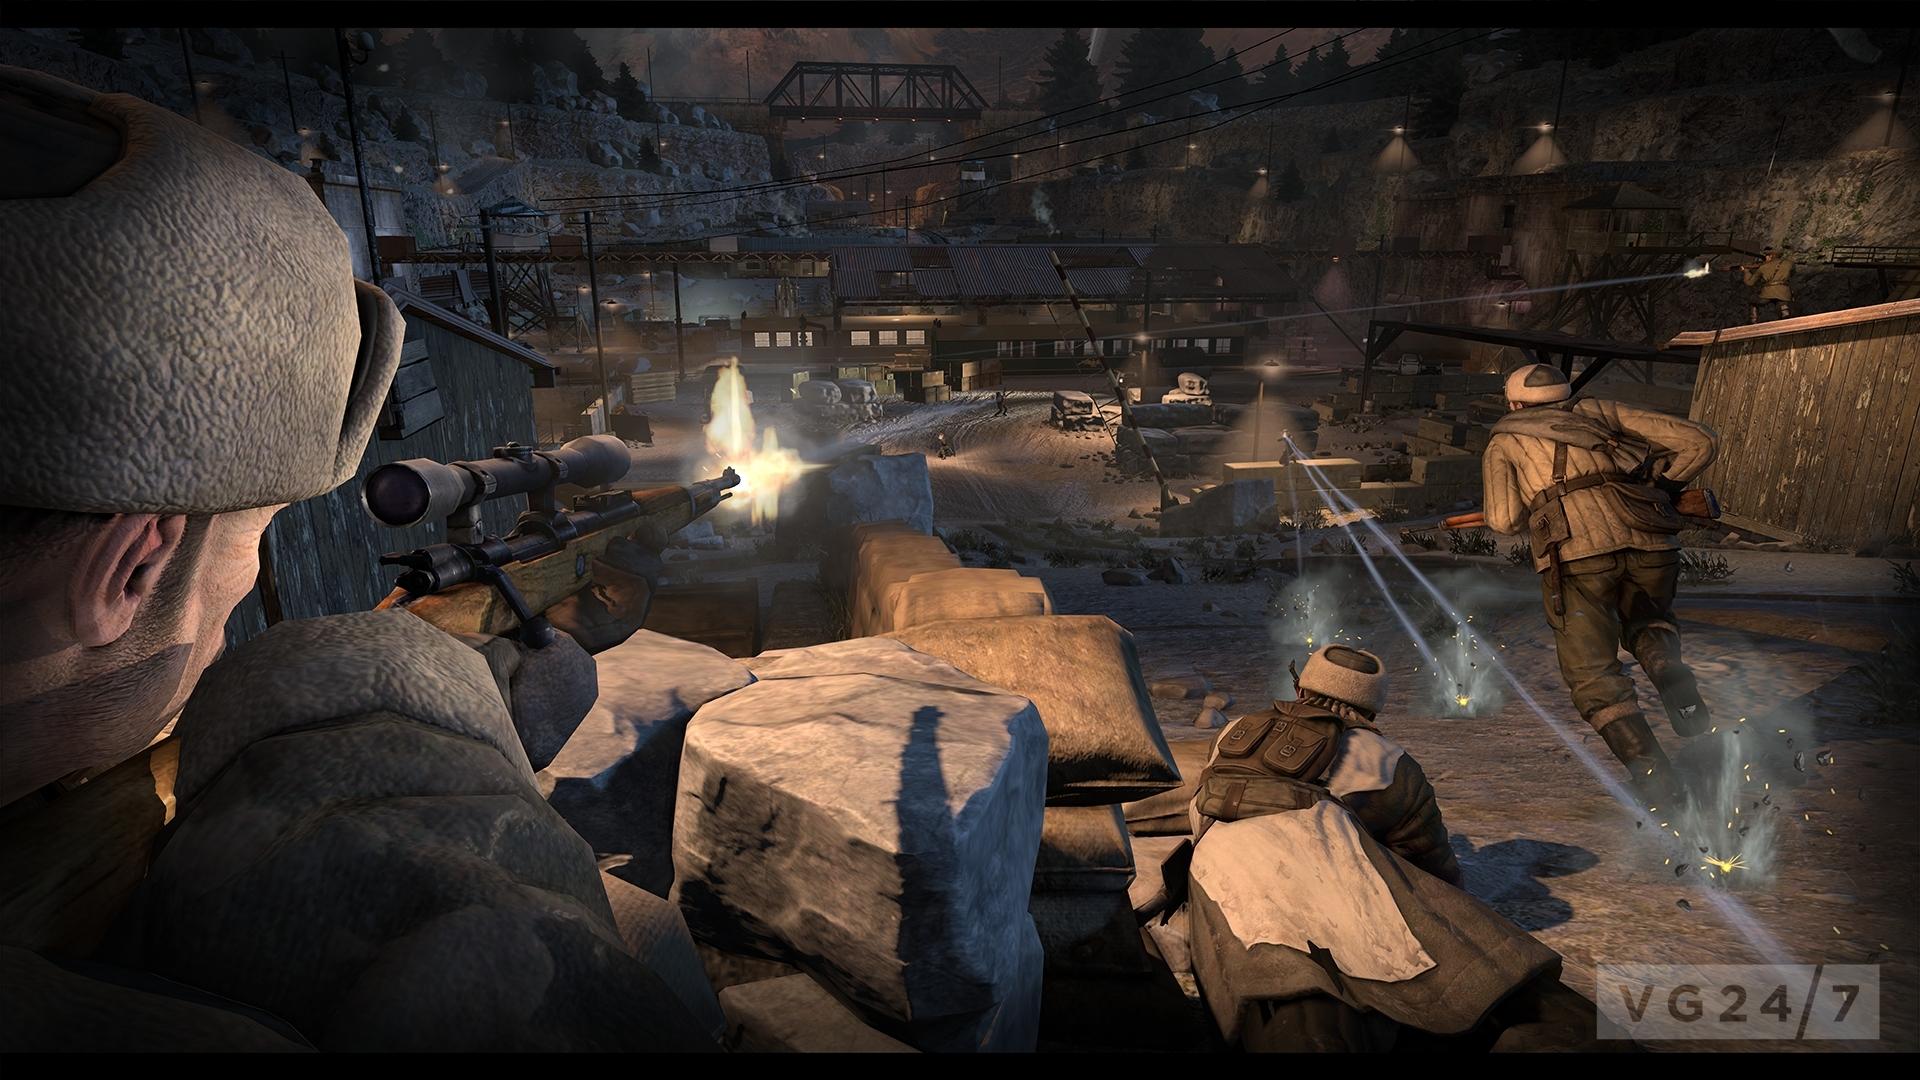 sniper elite v2 xbox360 sniper elite v2 xbox360 Sniper Elite V2 Xbox360 Sniper Elite V2 Xbox360